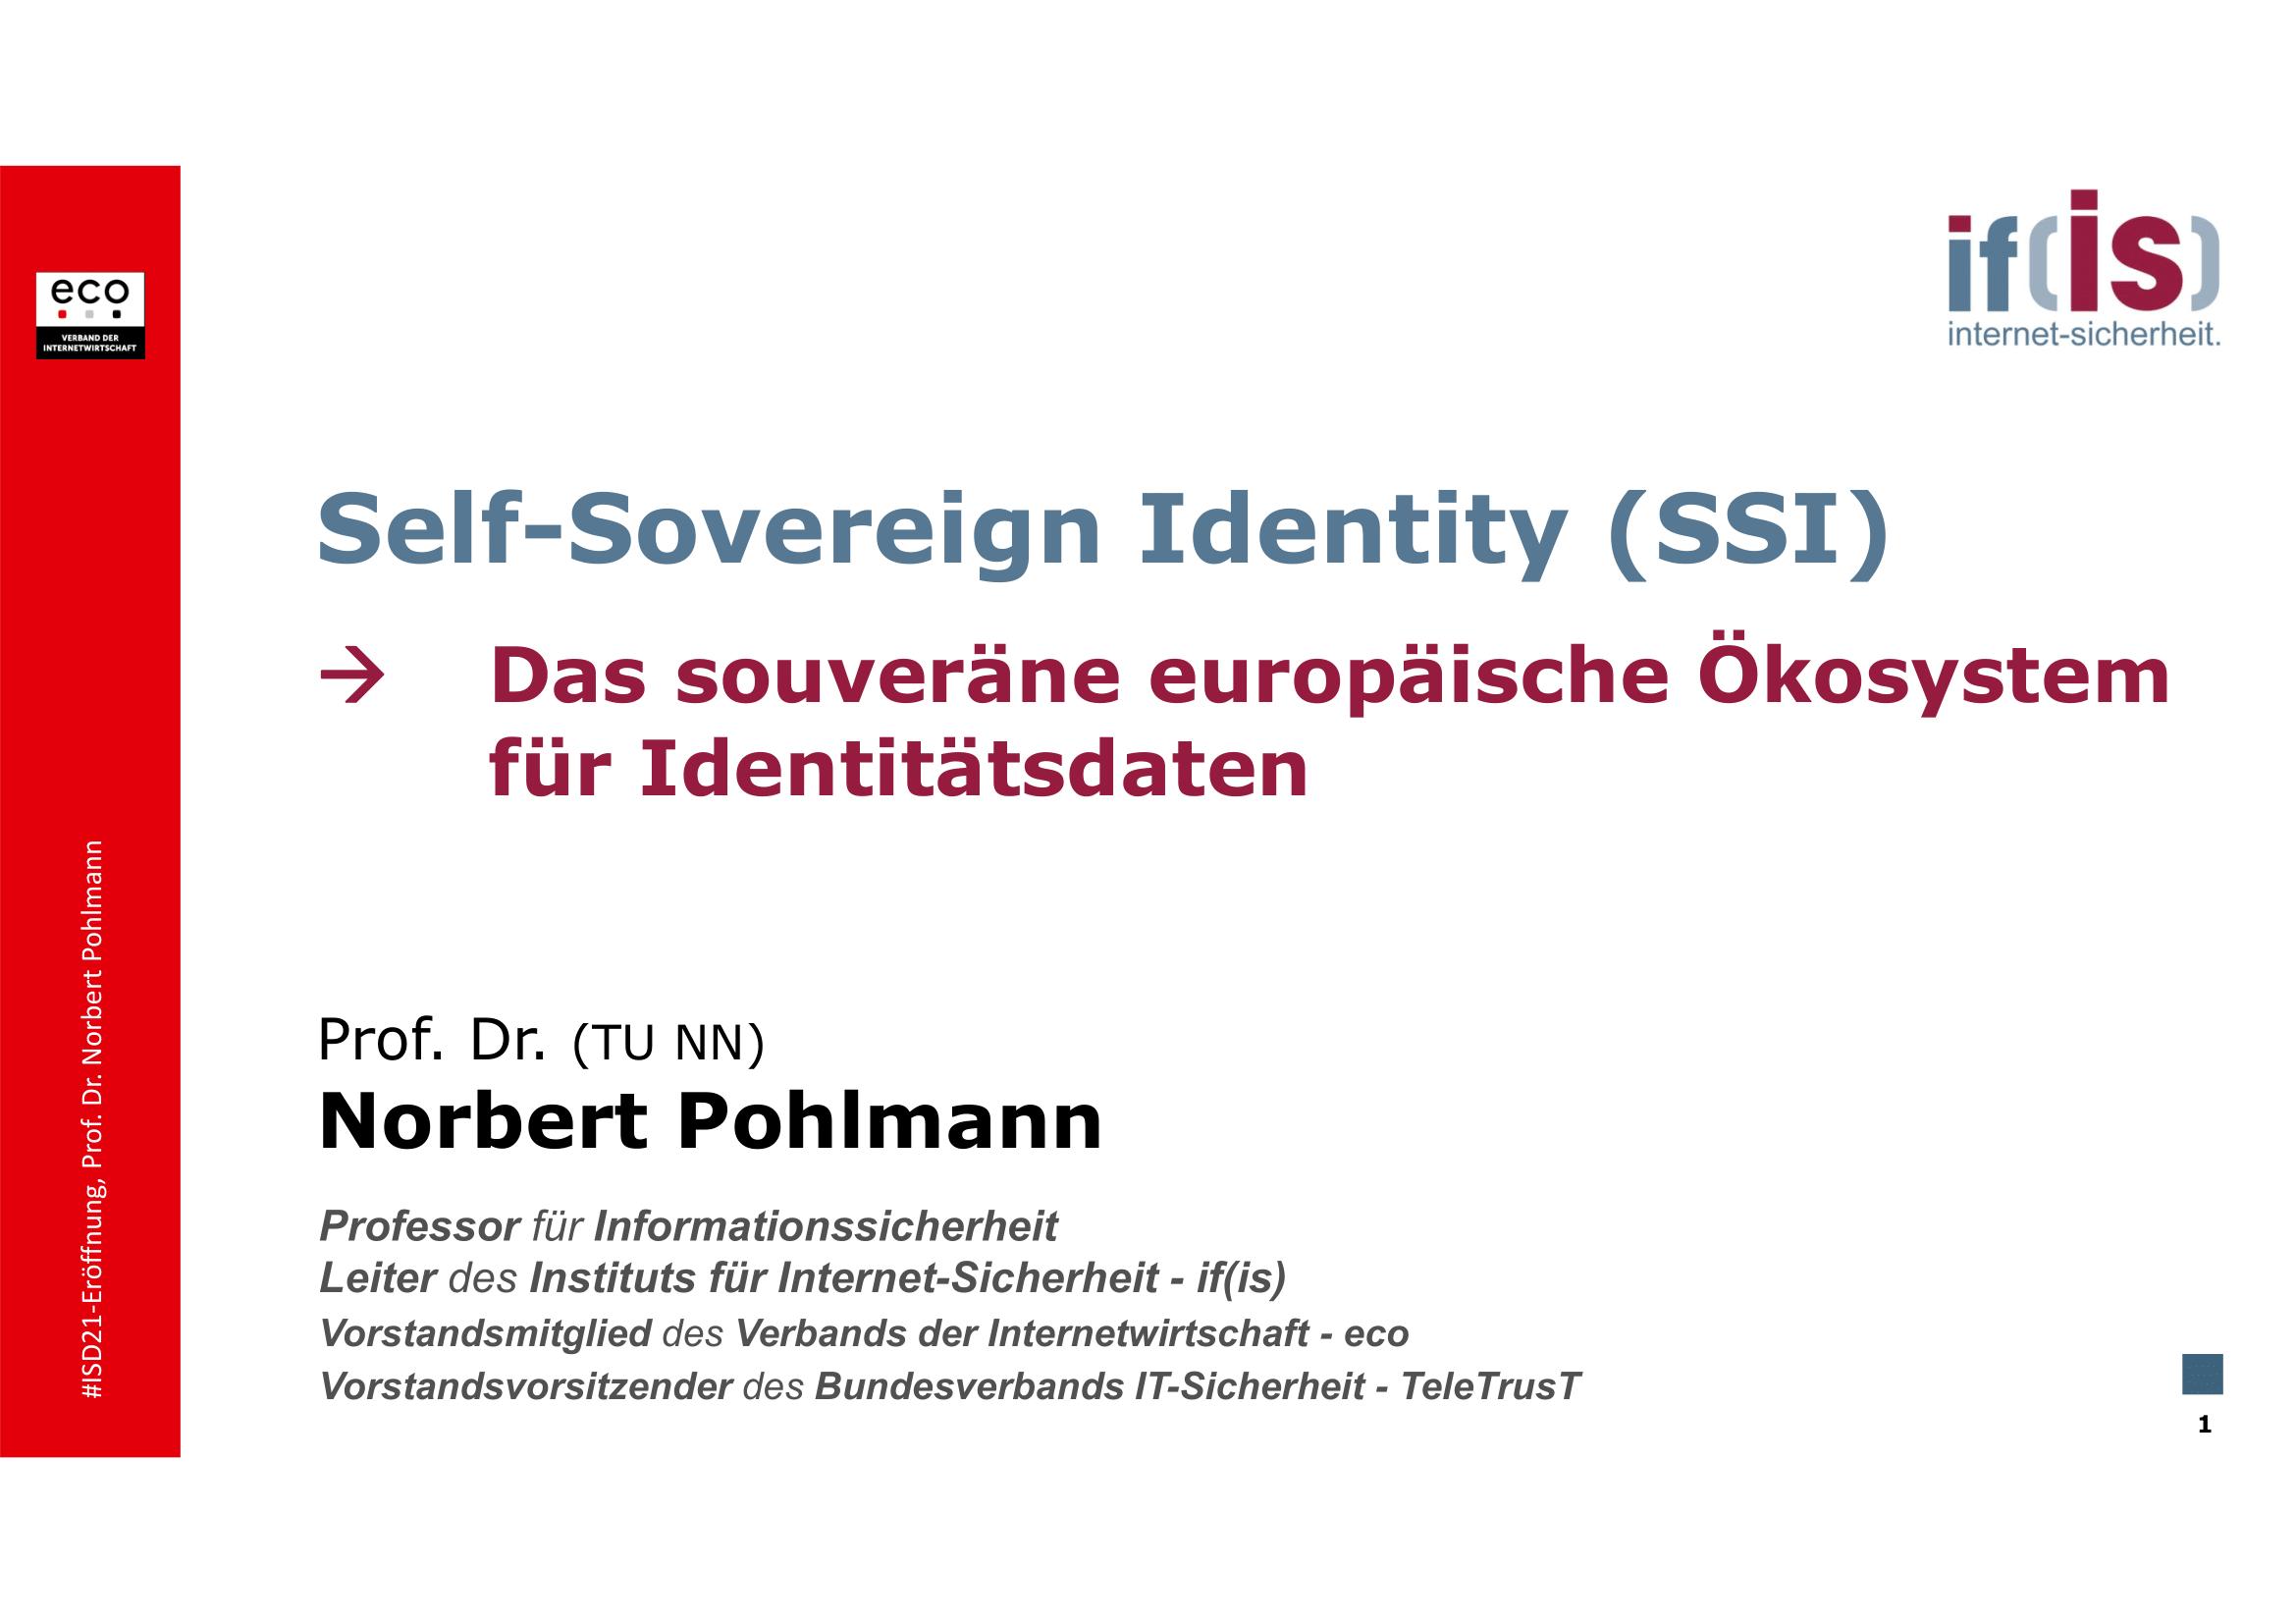 394 - Self-Sovereign Identity (SSI) - Das souveräne europäische Ökosystem - Prof Norbert Pohlmann